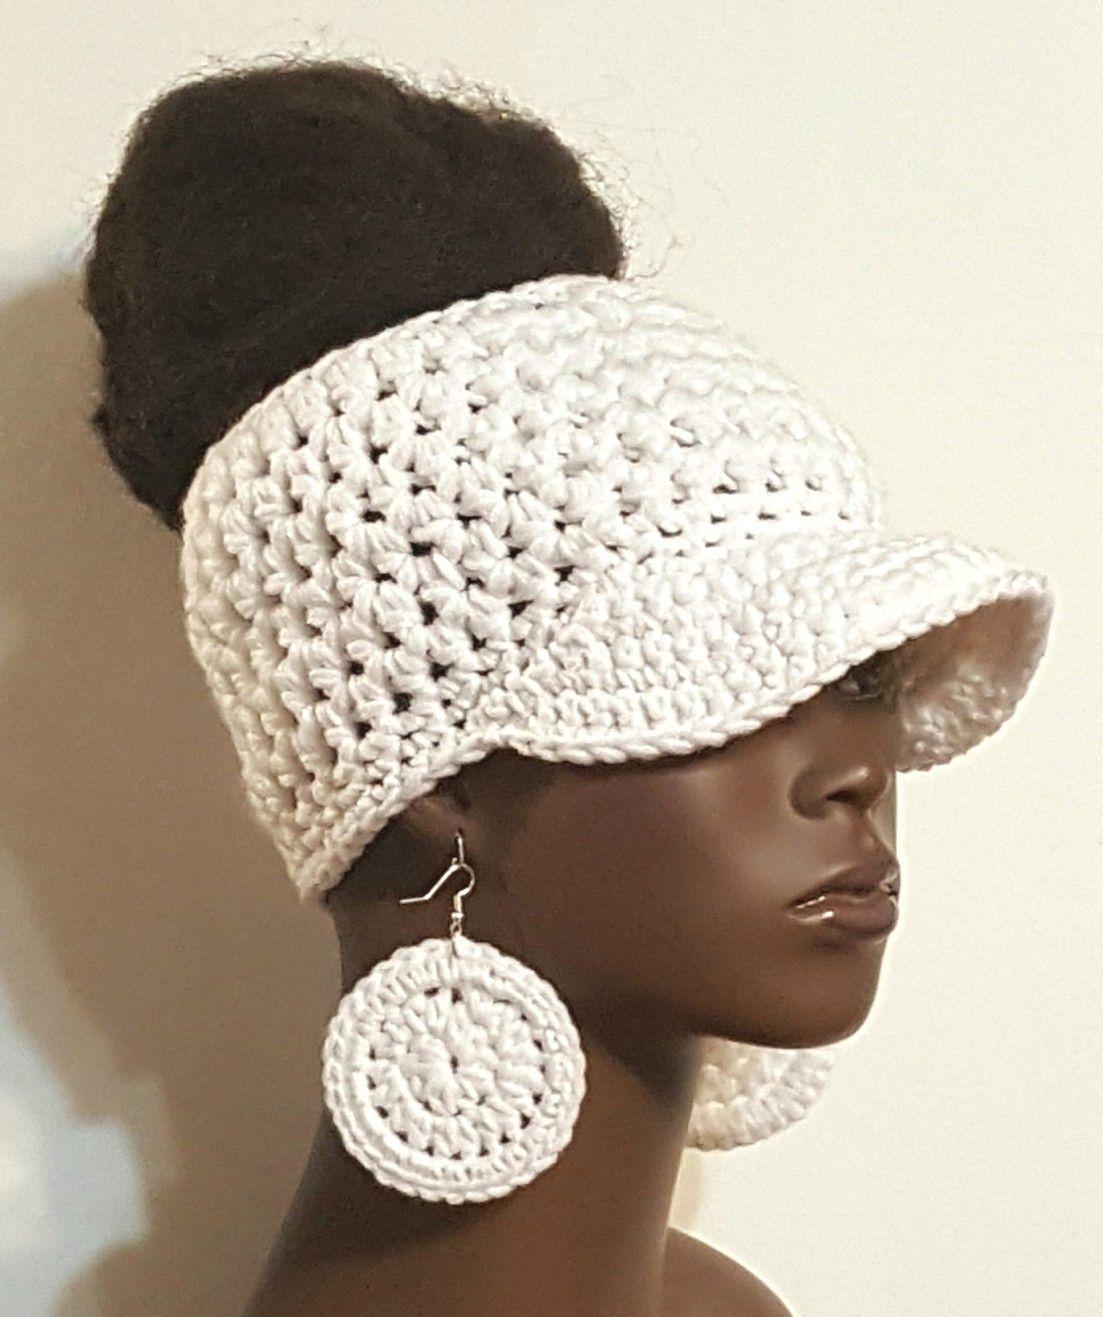 White Messy Bun Crochet Baseball Cap With Earrings By